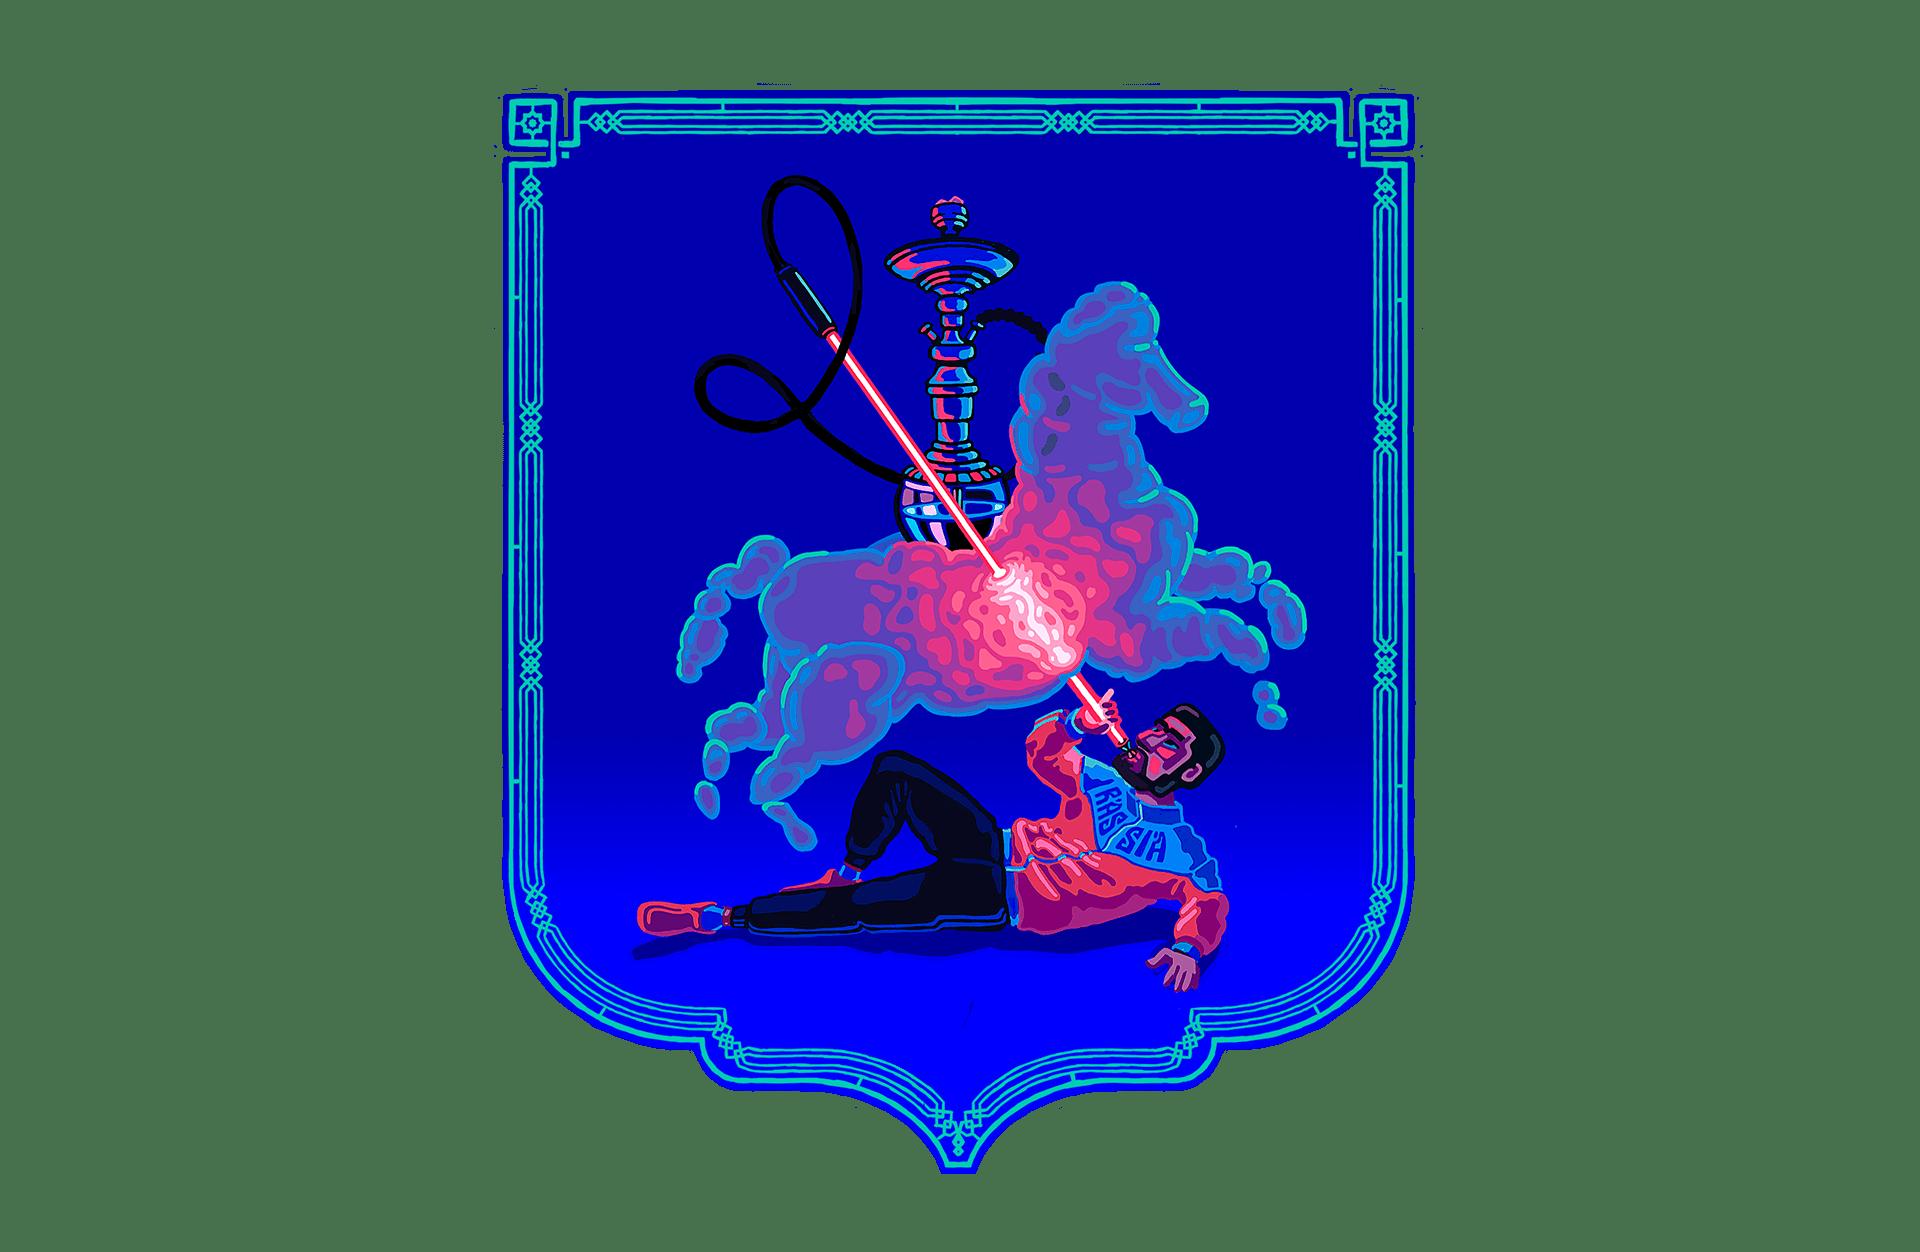 32 - Новый герб Москвы